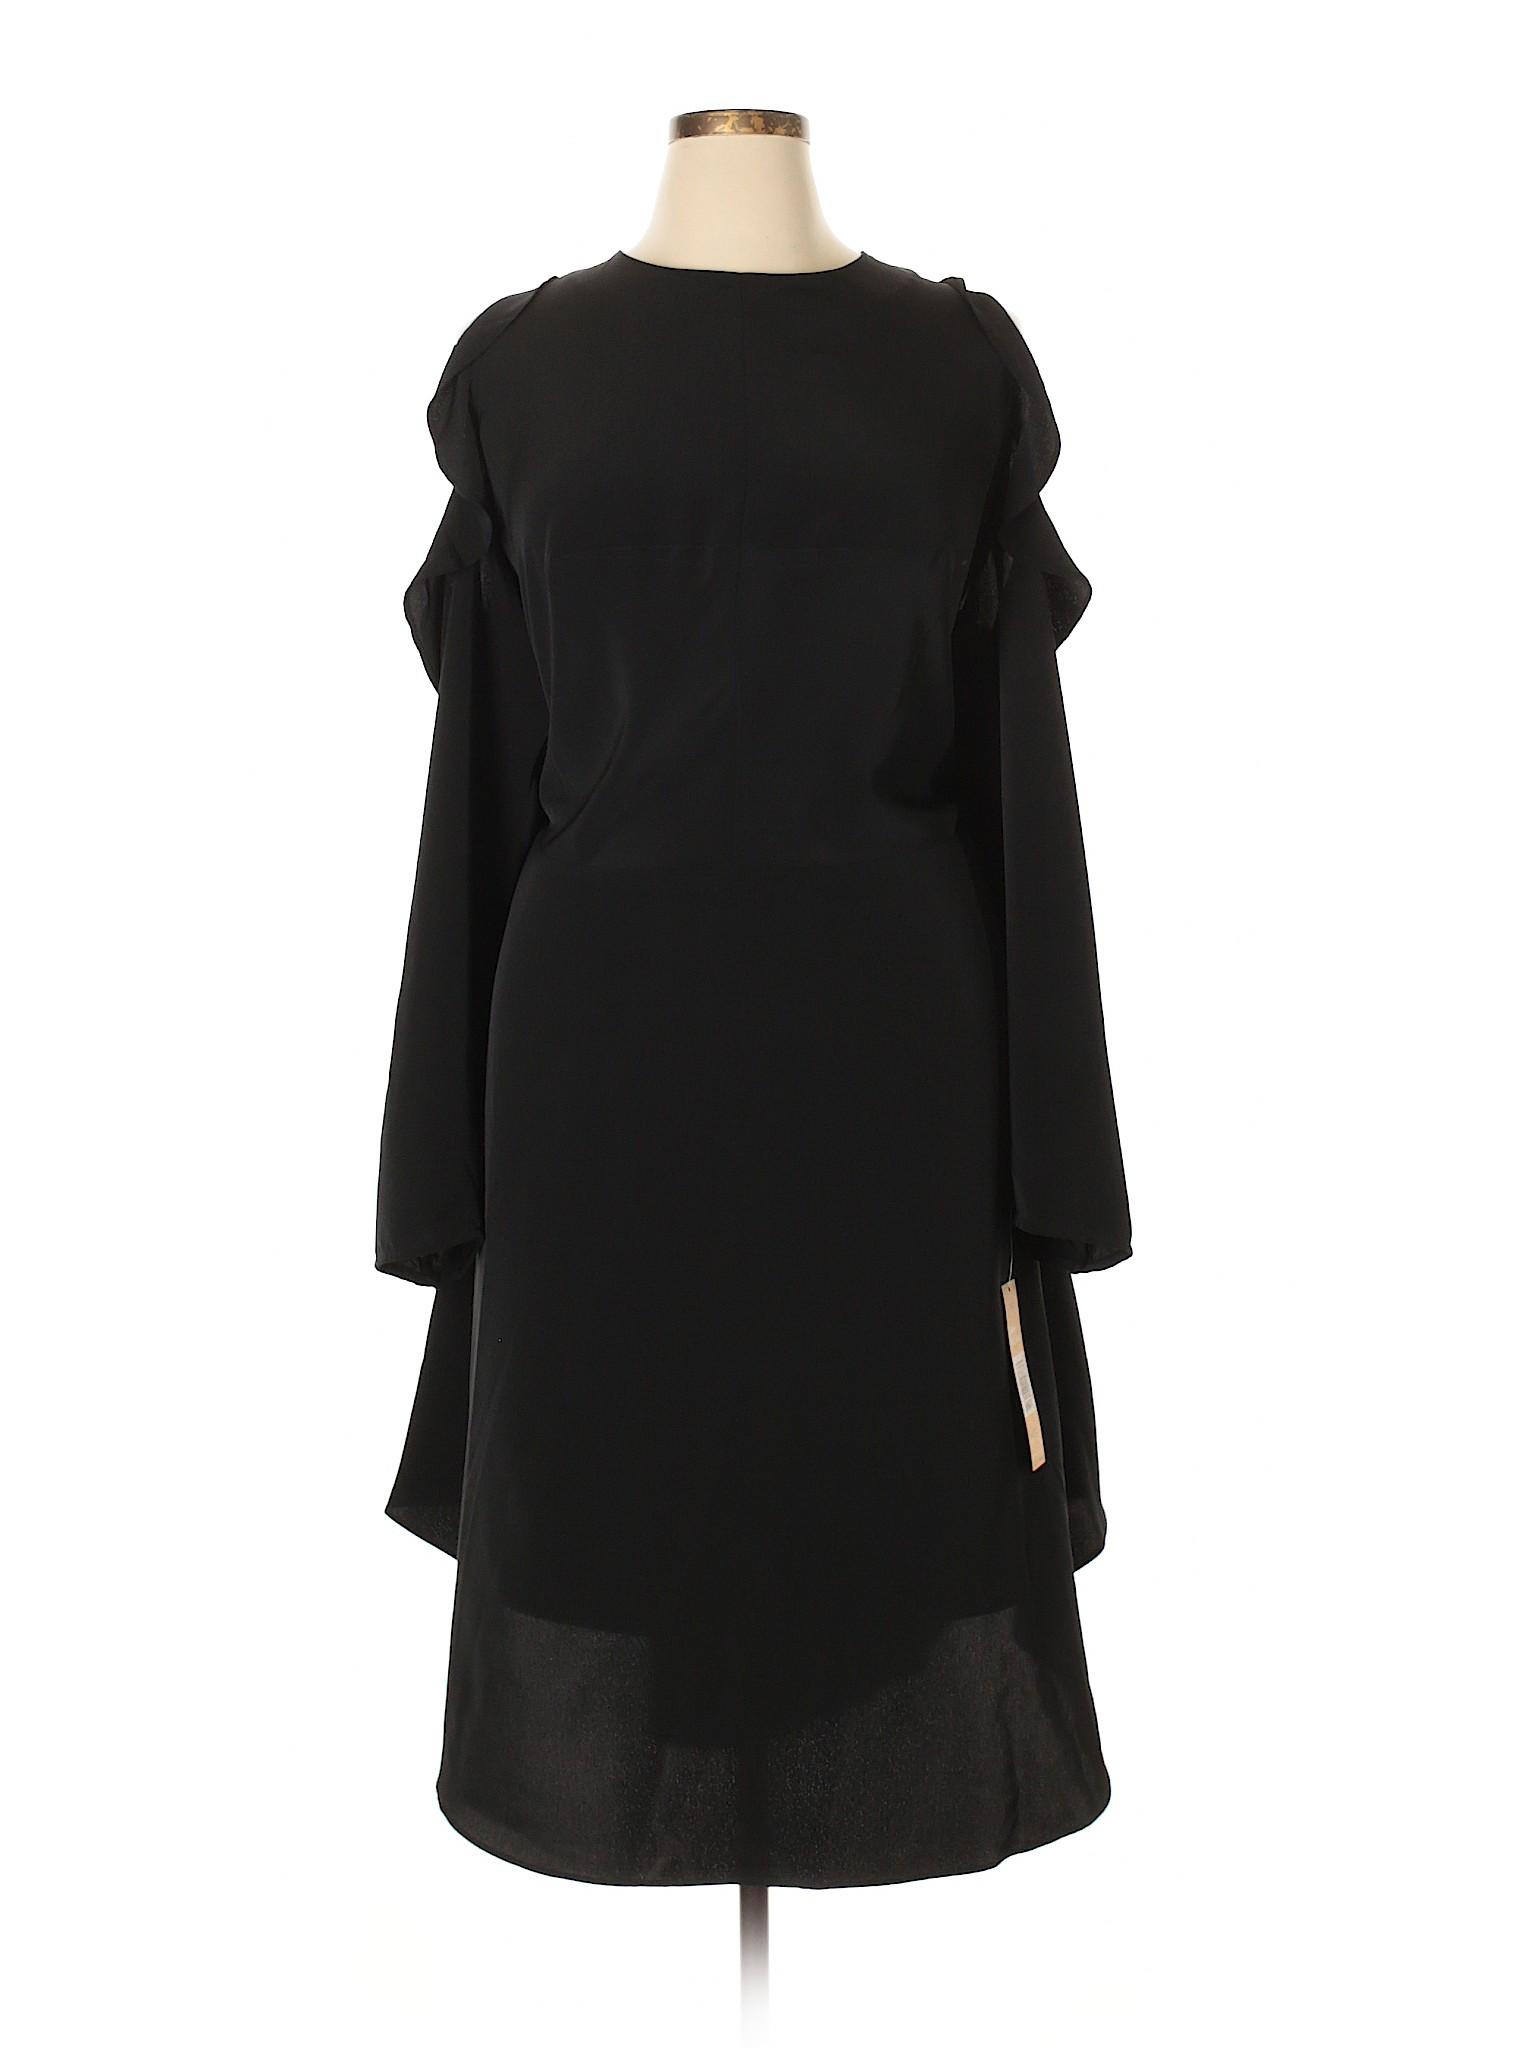 Dress RACHEL winter Casual Rachel Boutique Roy 06PqX